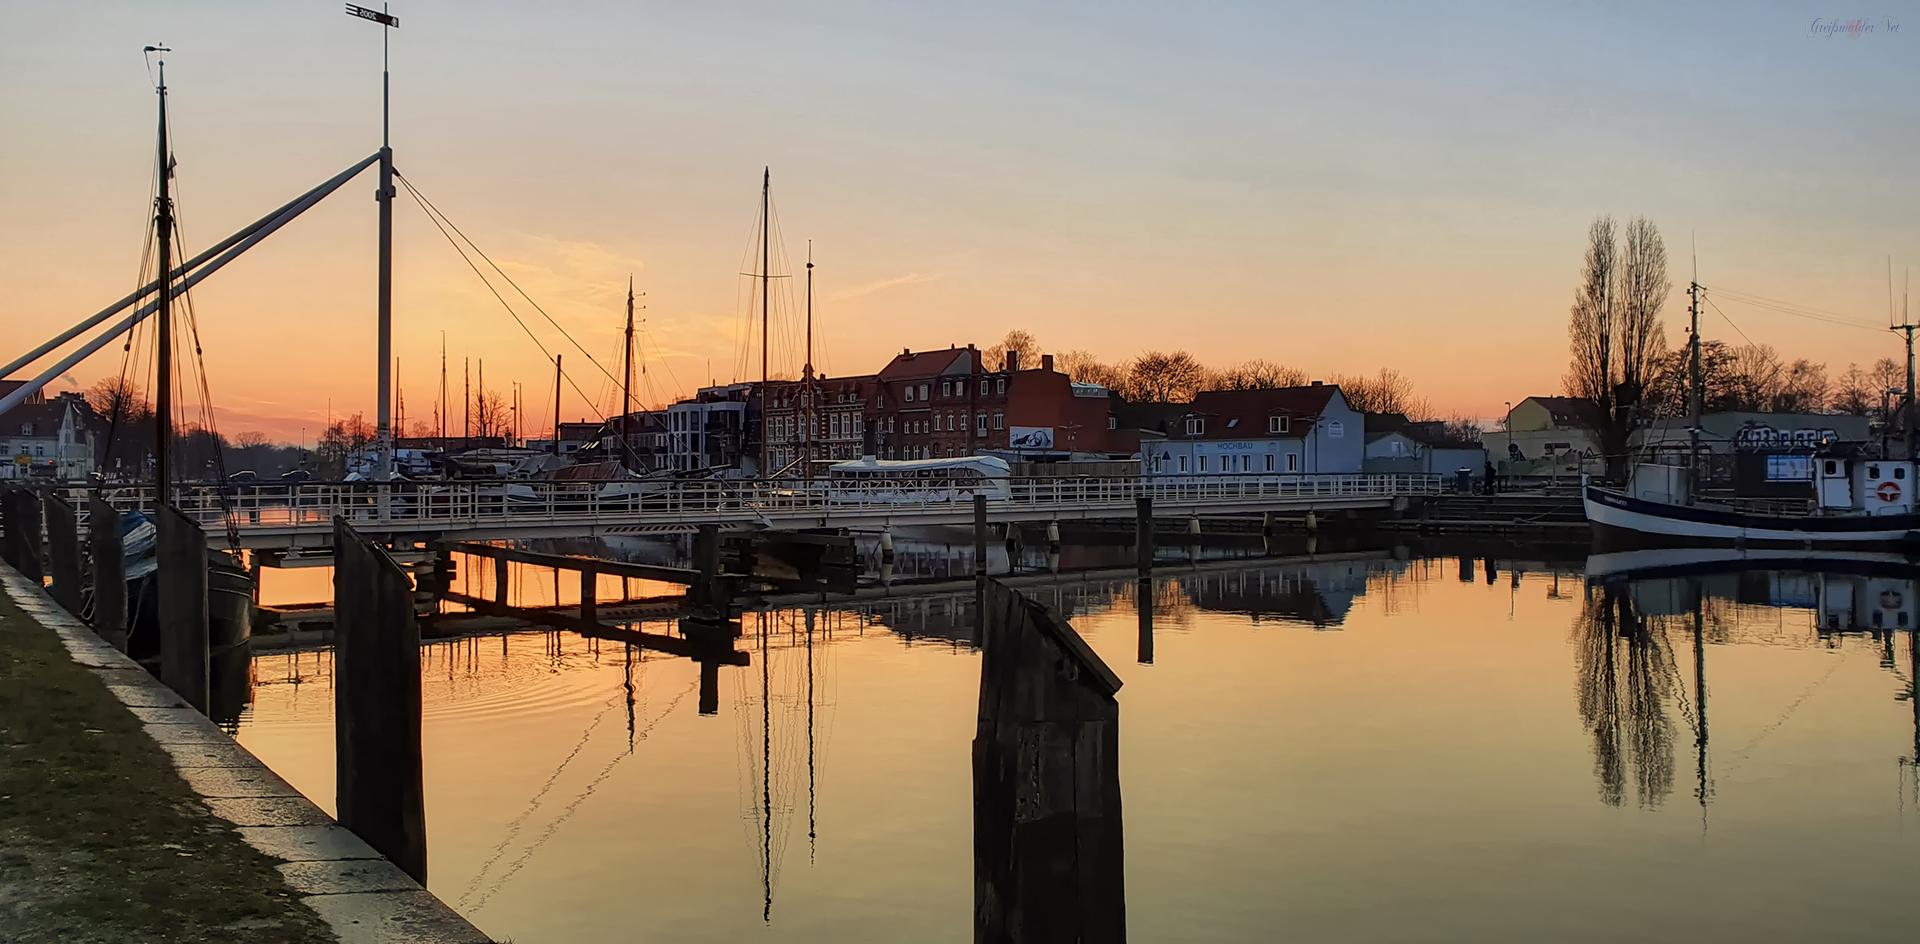 Sonnenuntergang am Museumshafen Greifswald